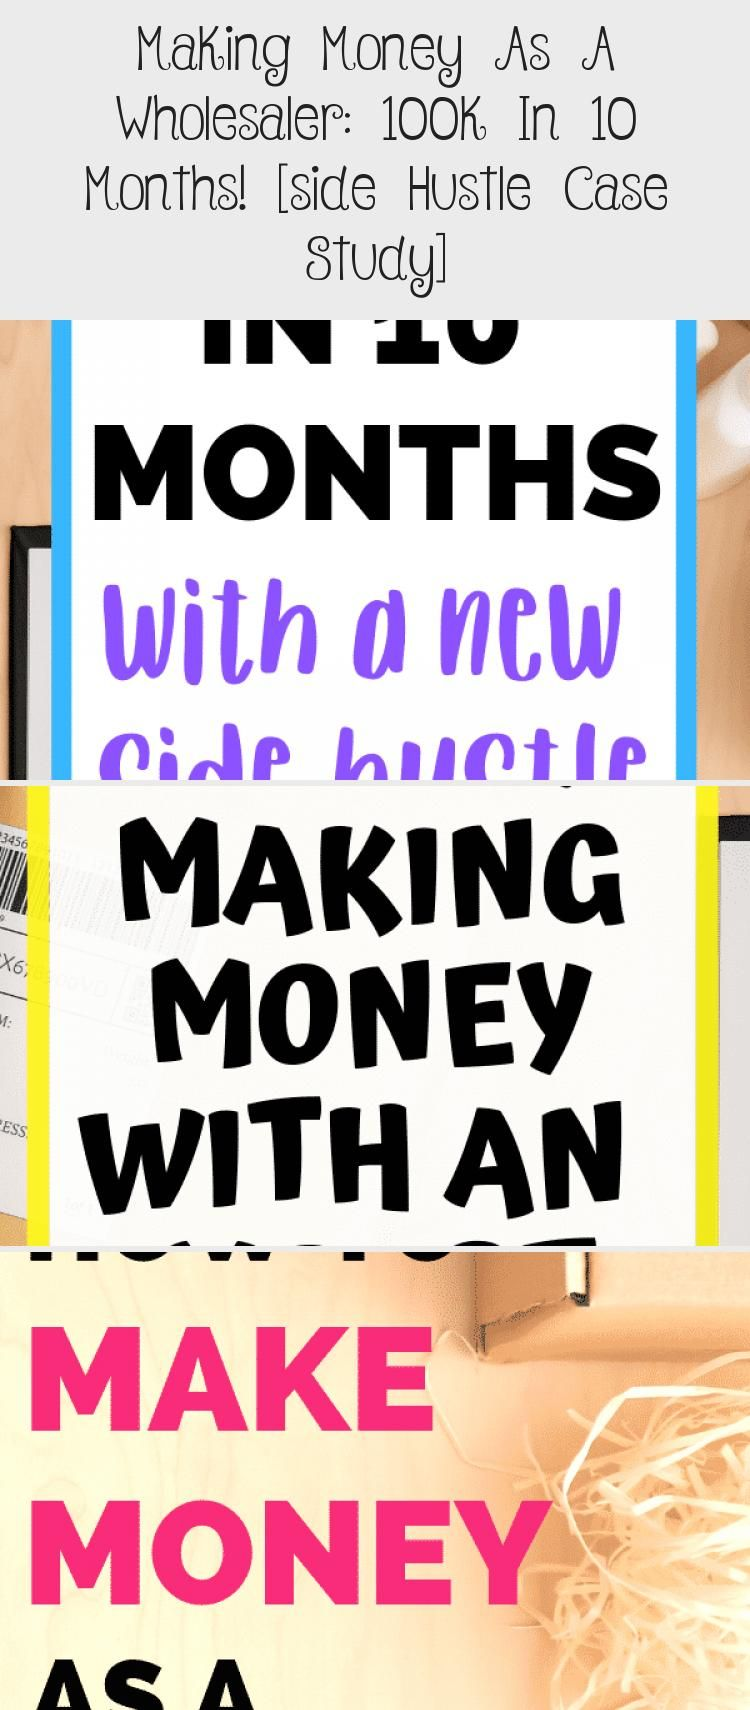 Making Money As A Wholesaler: 100k In 10 Months! [side Hustle Case Study] - Make Money Ideas